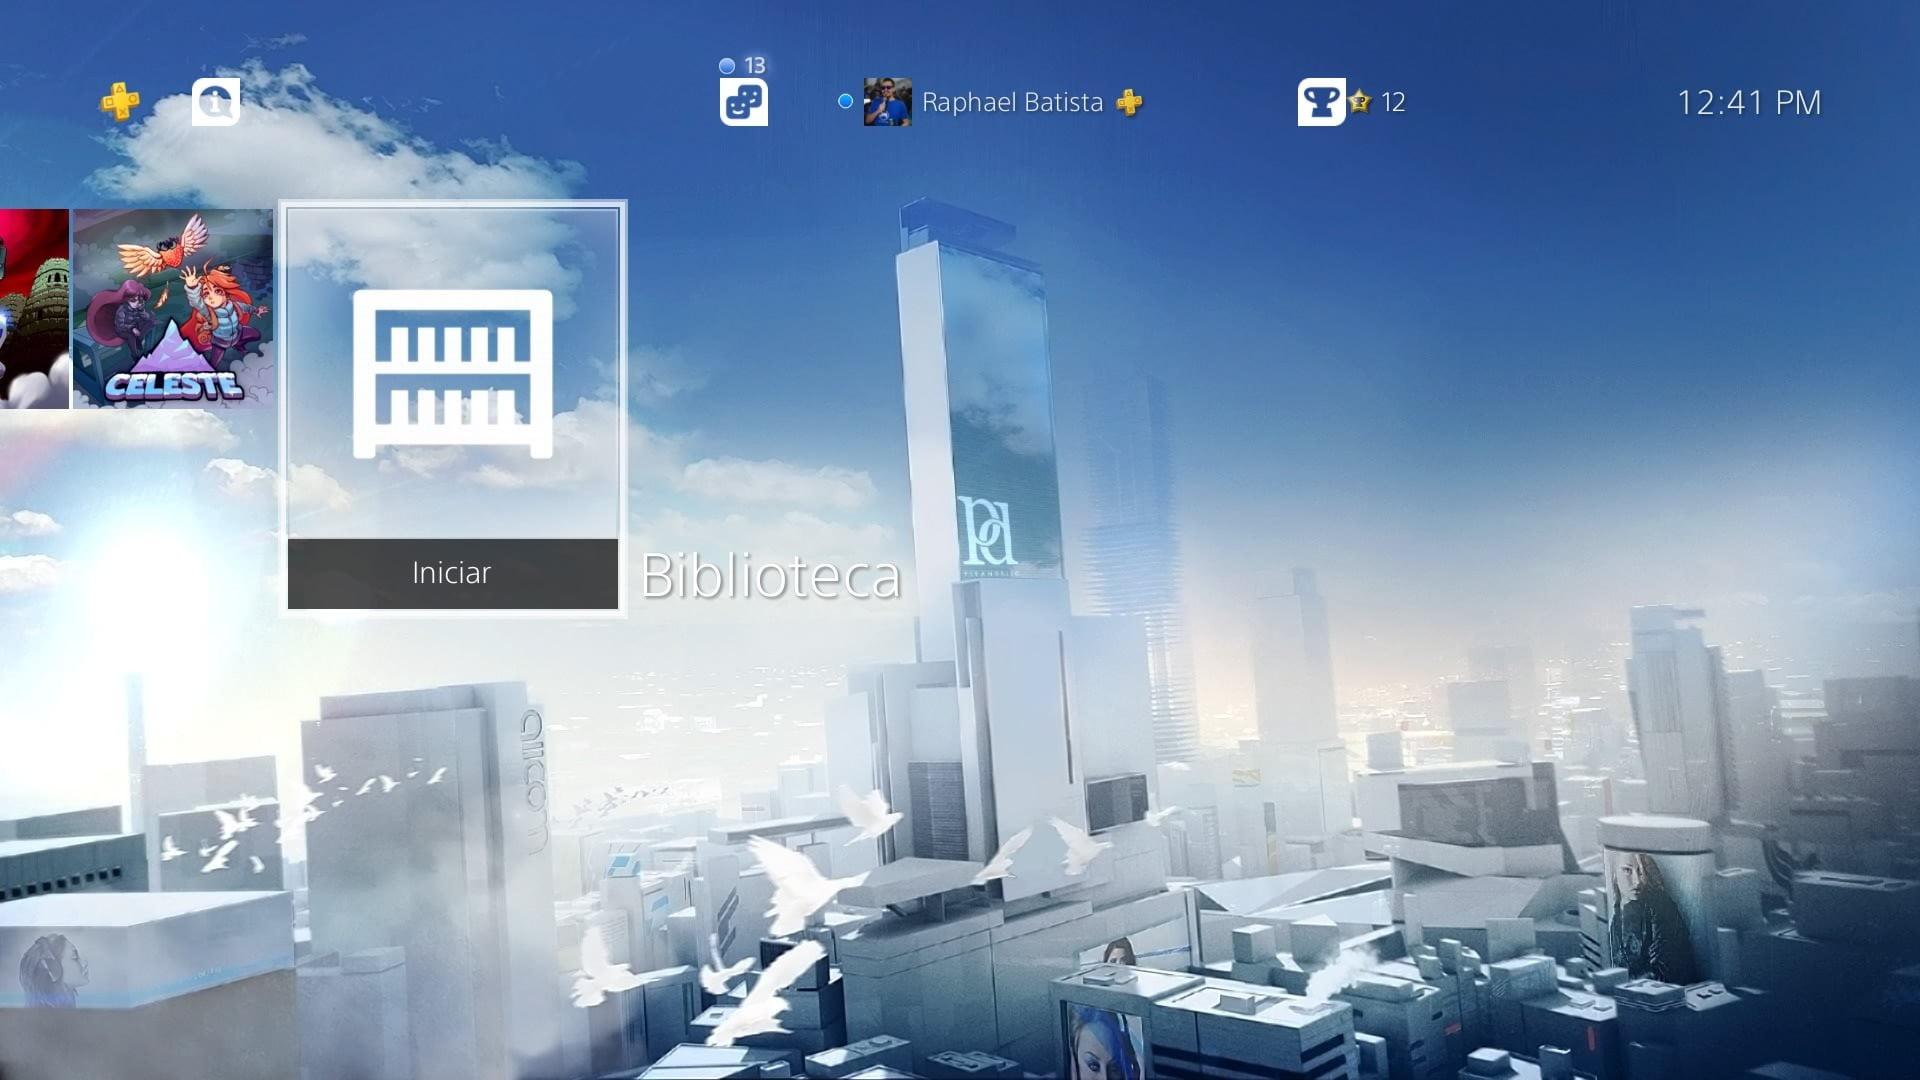 Tema gratuito de Mirror's Edge Catalyst está disponível na PS Store 1